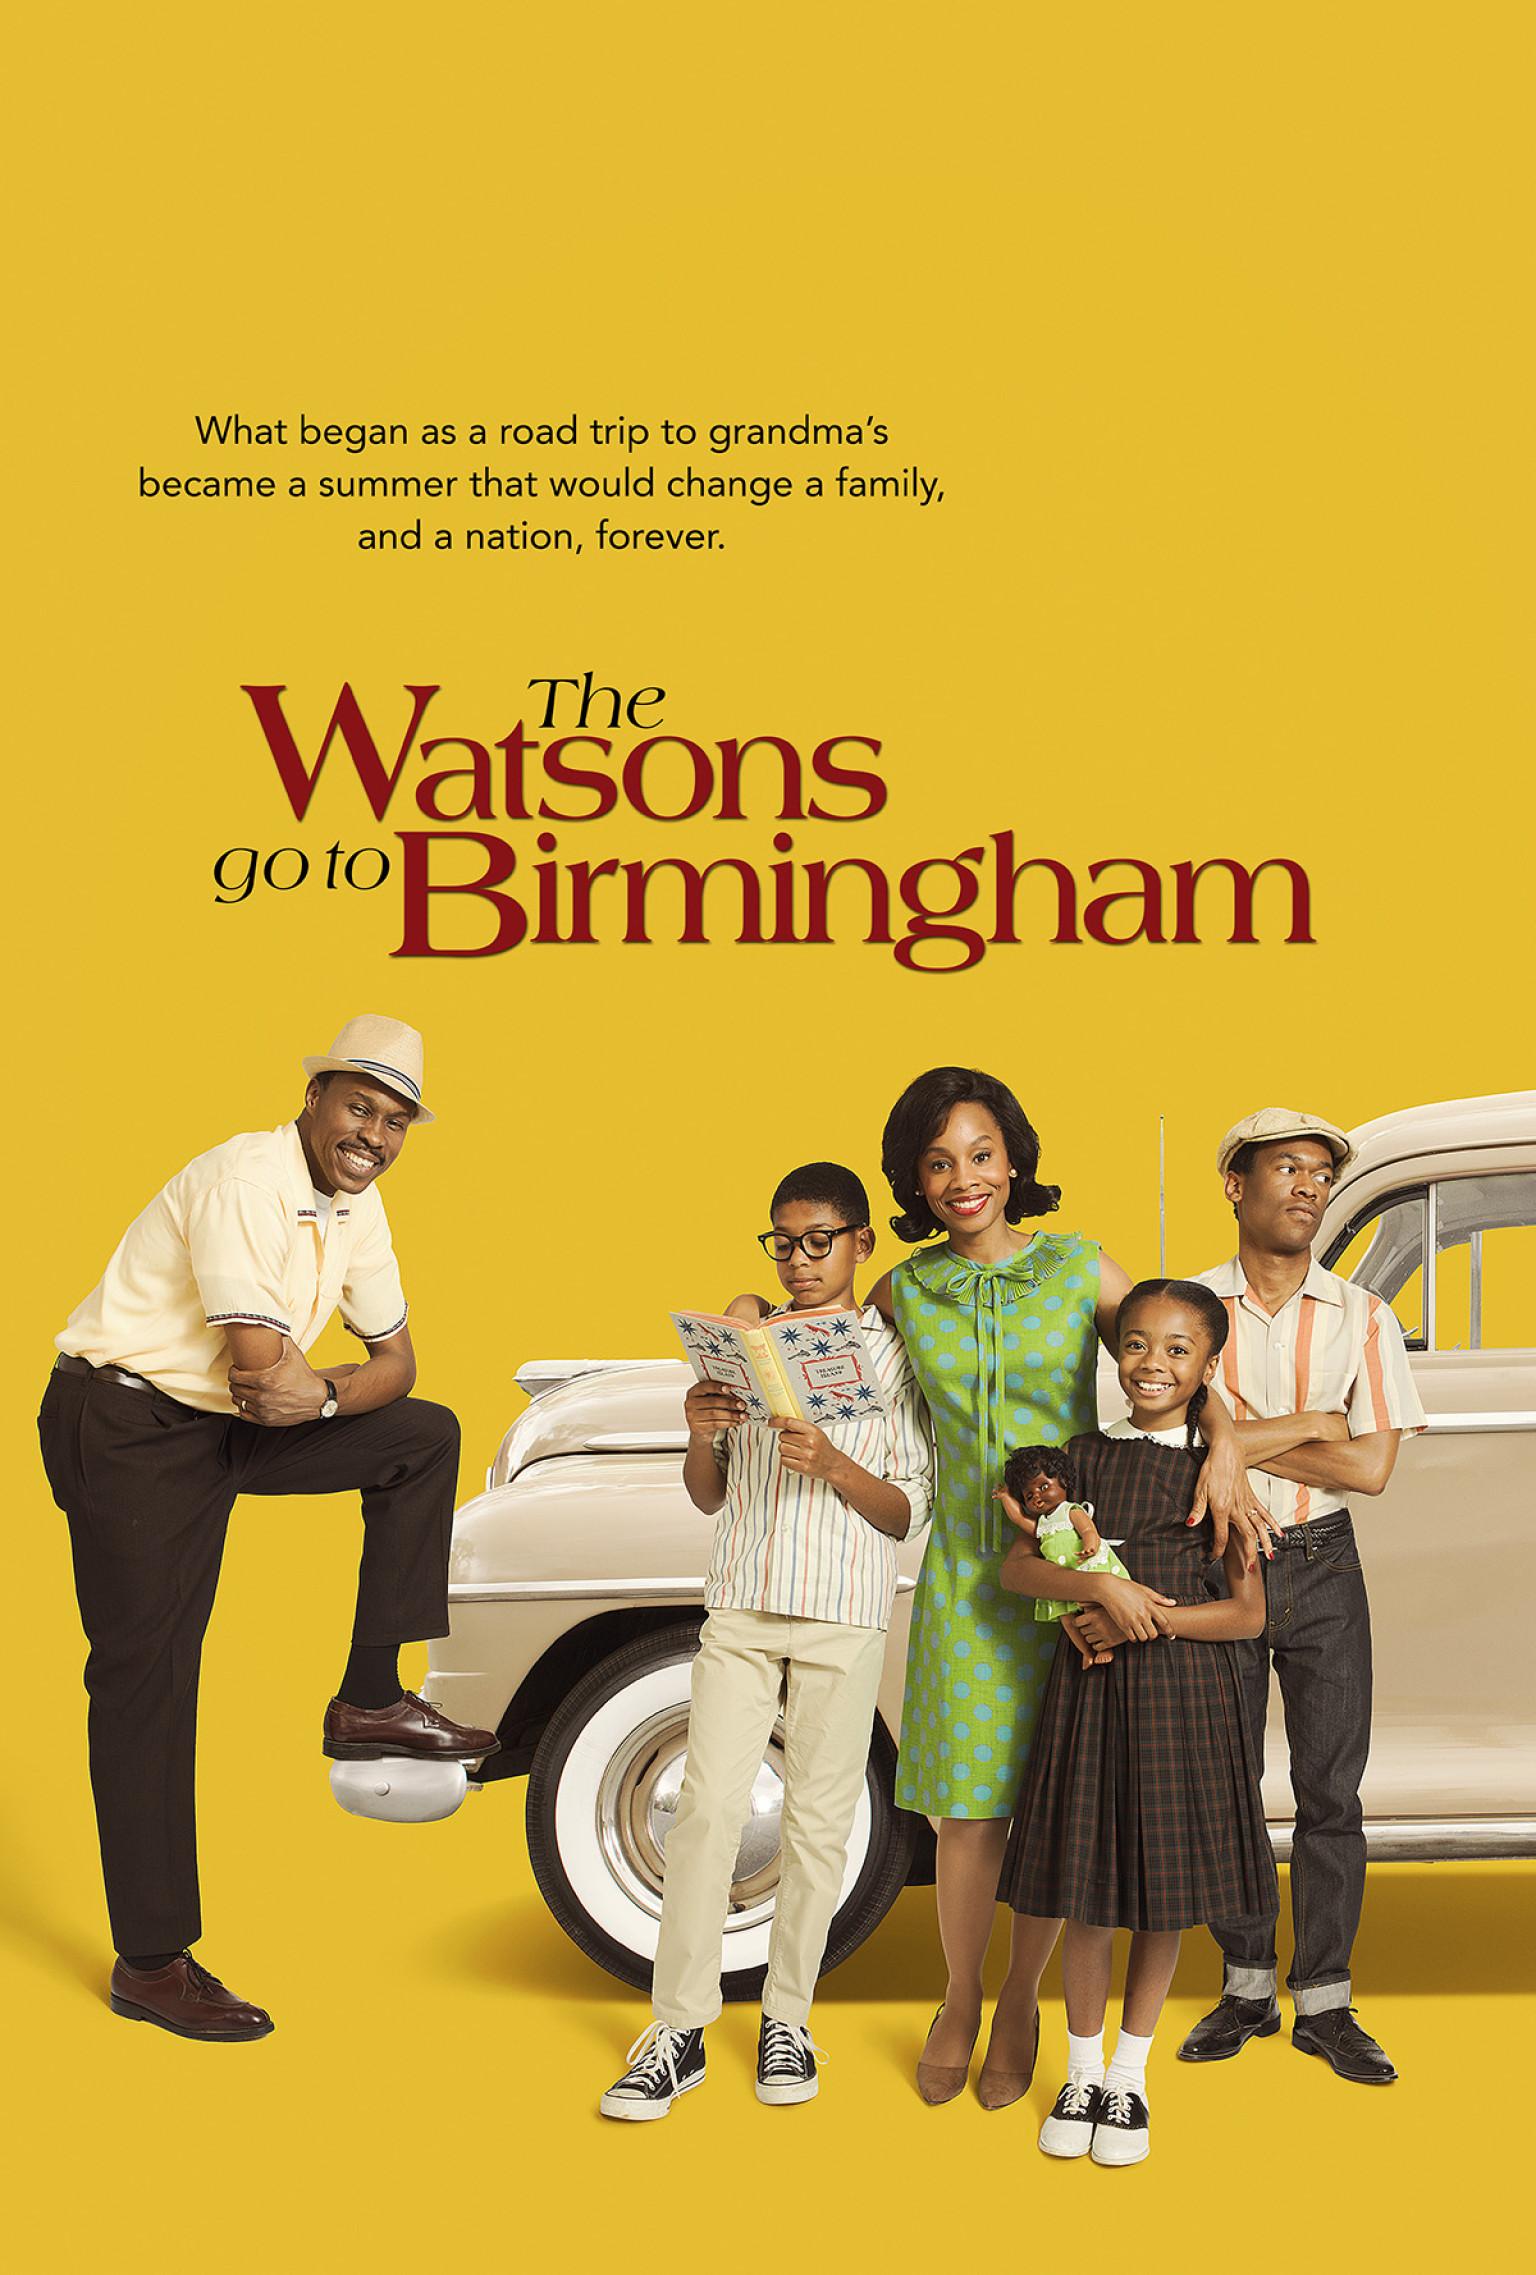 The Watsons Go To Birmingham Novel Adaptation Set To